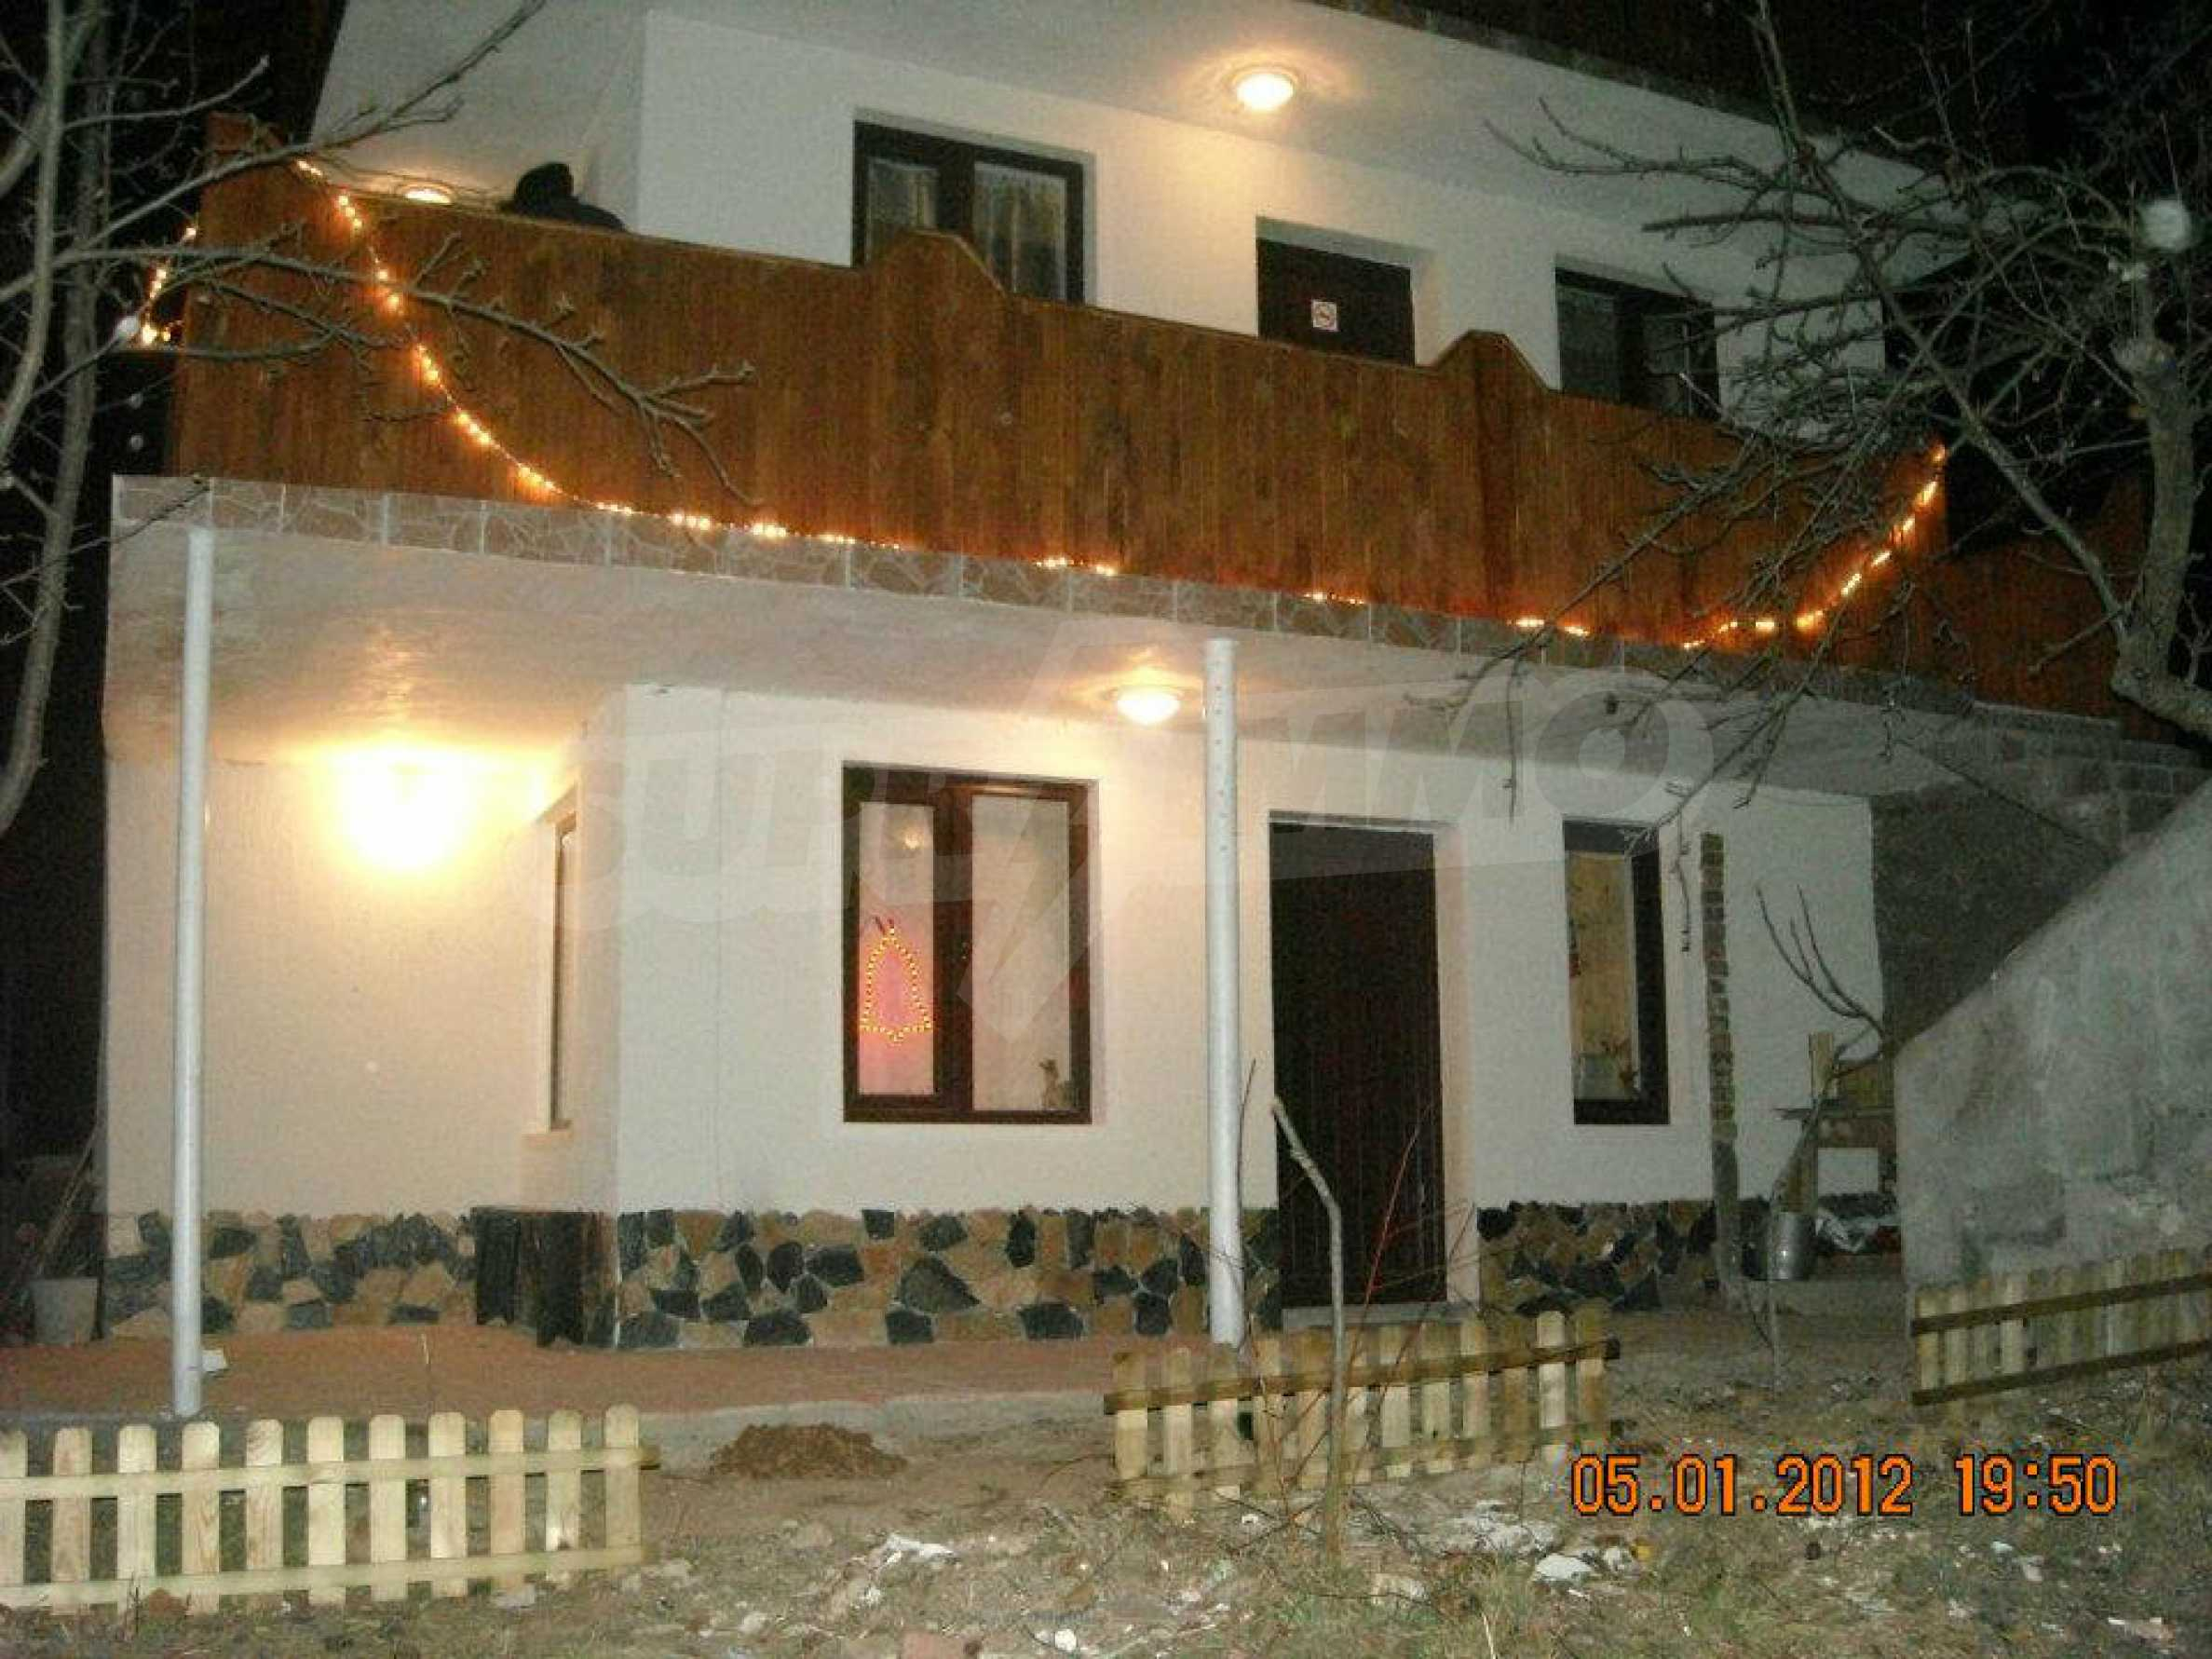 3-storey villa with garden and small plunge pool near Belogradchik 1